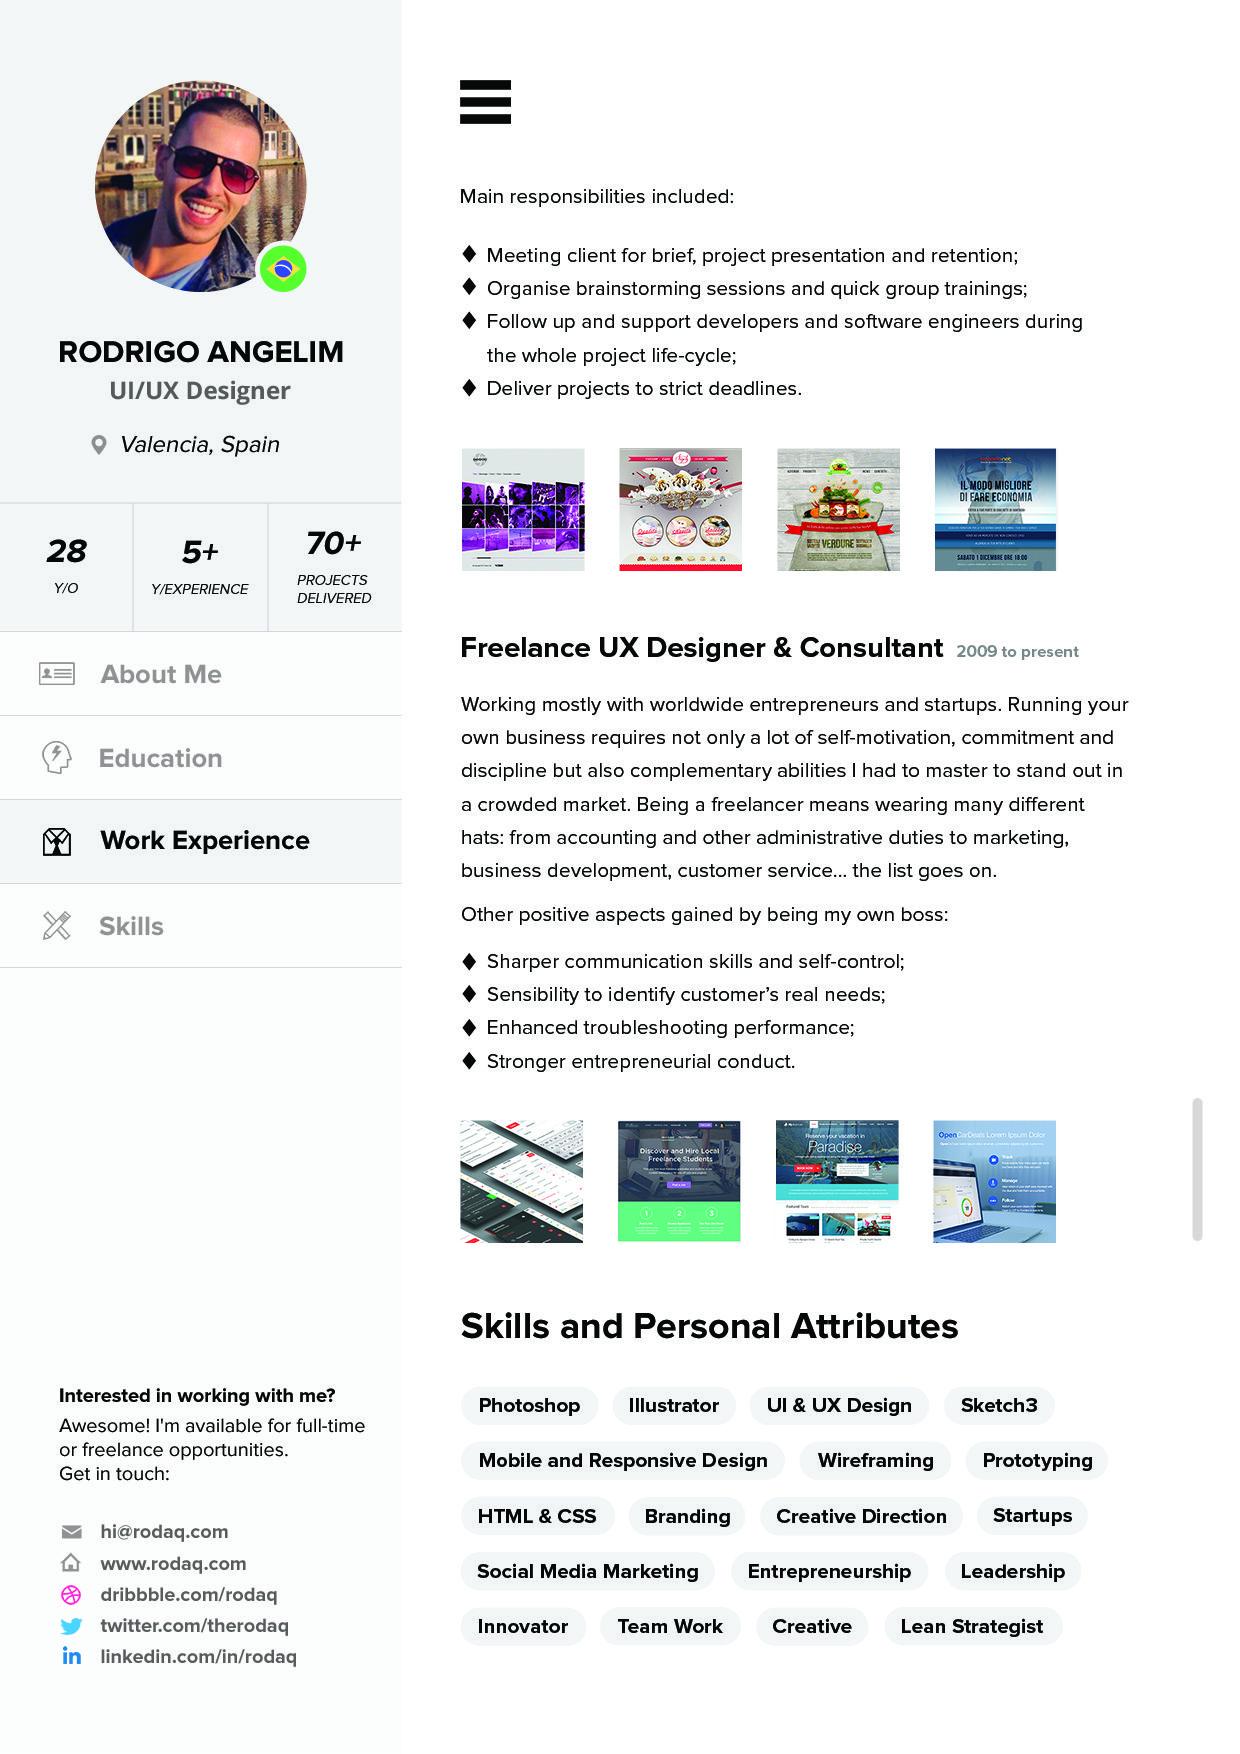 Three page curriculum vitae template set | Creative resume templates ...